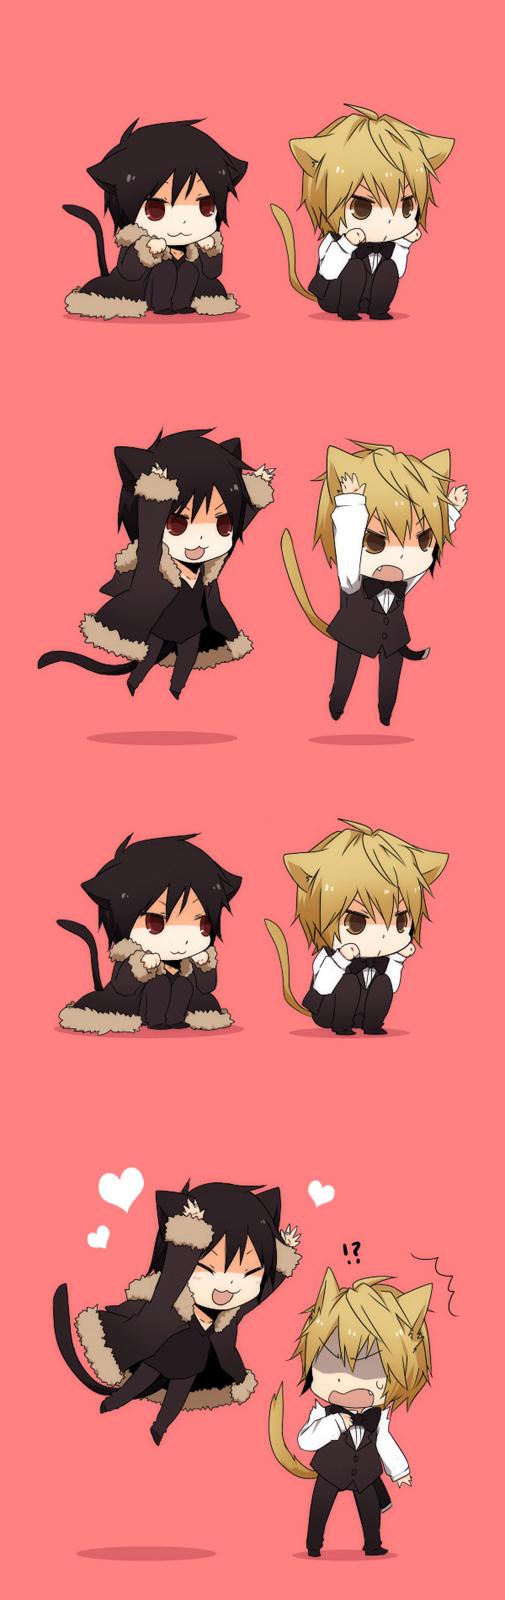 Shizuo and Izaya as kitties